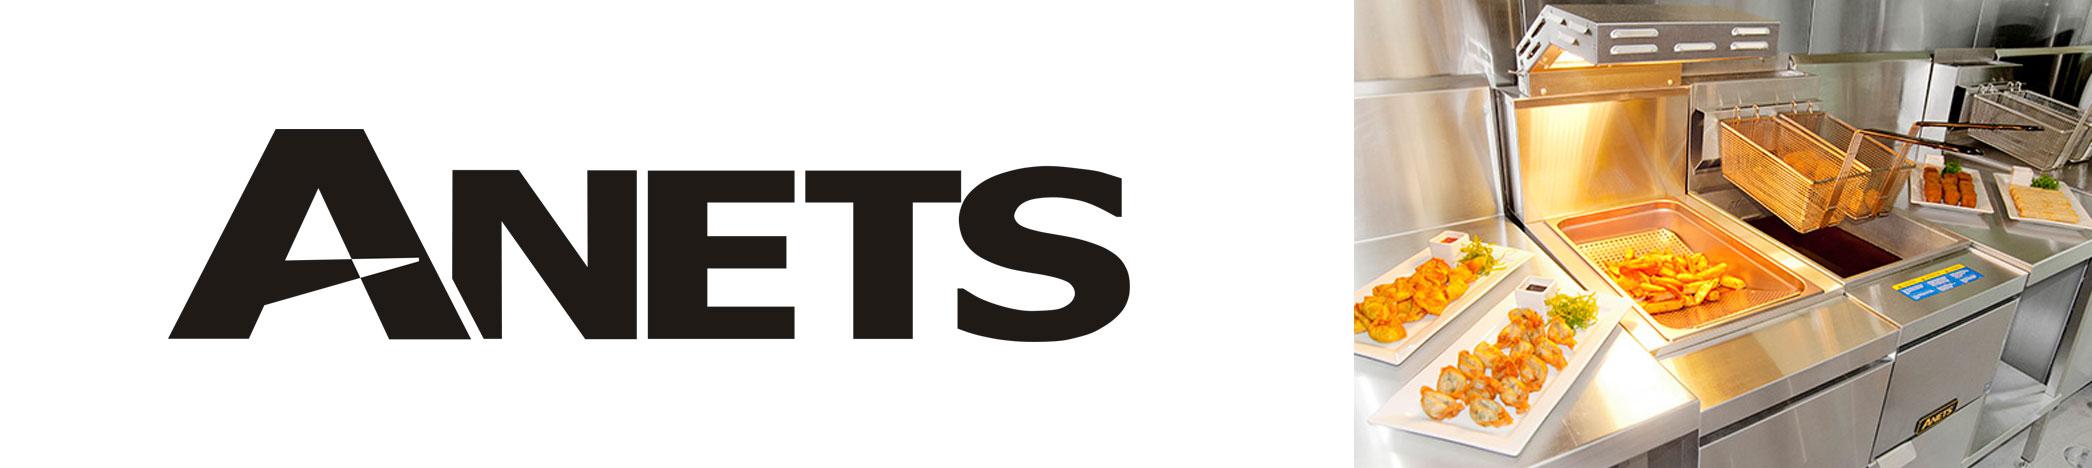 anets-brand.jpg